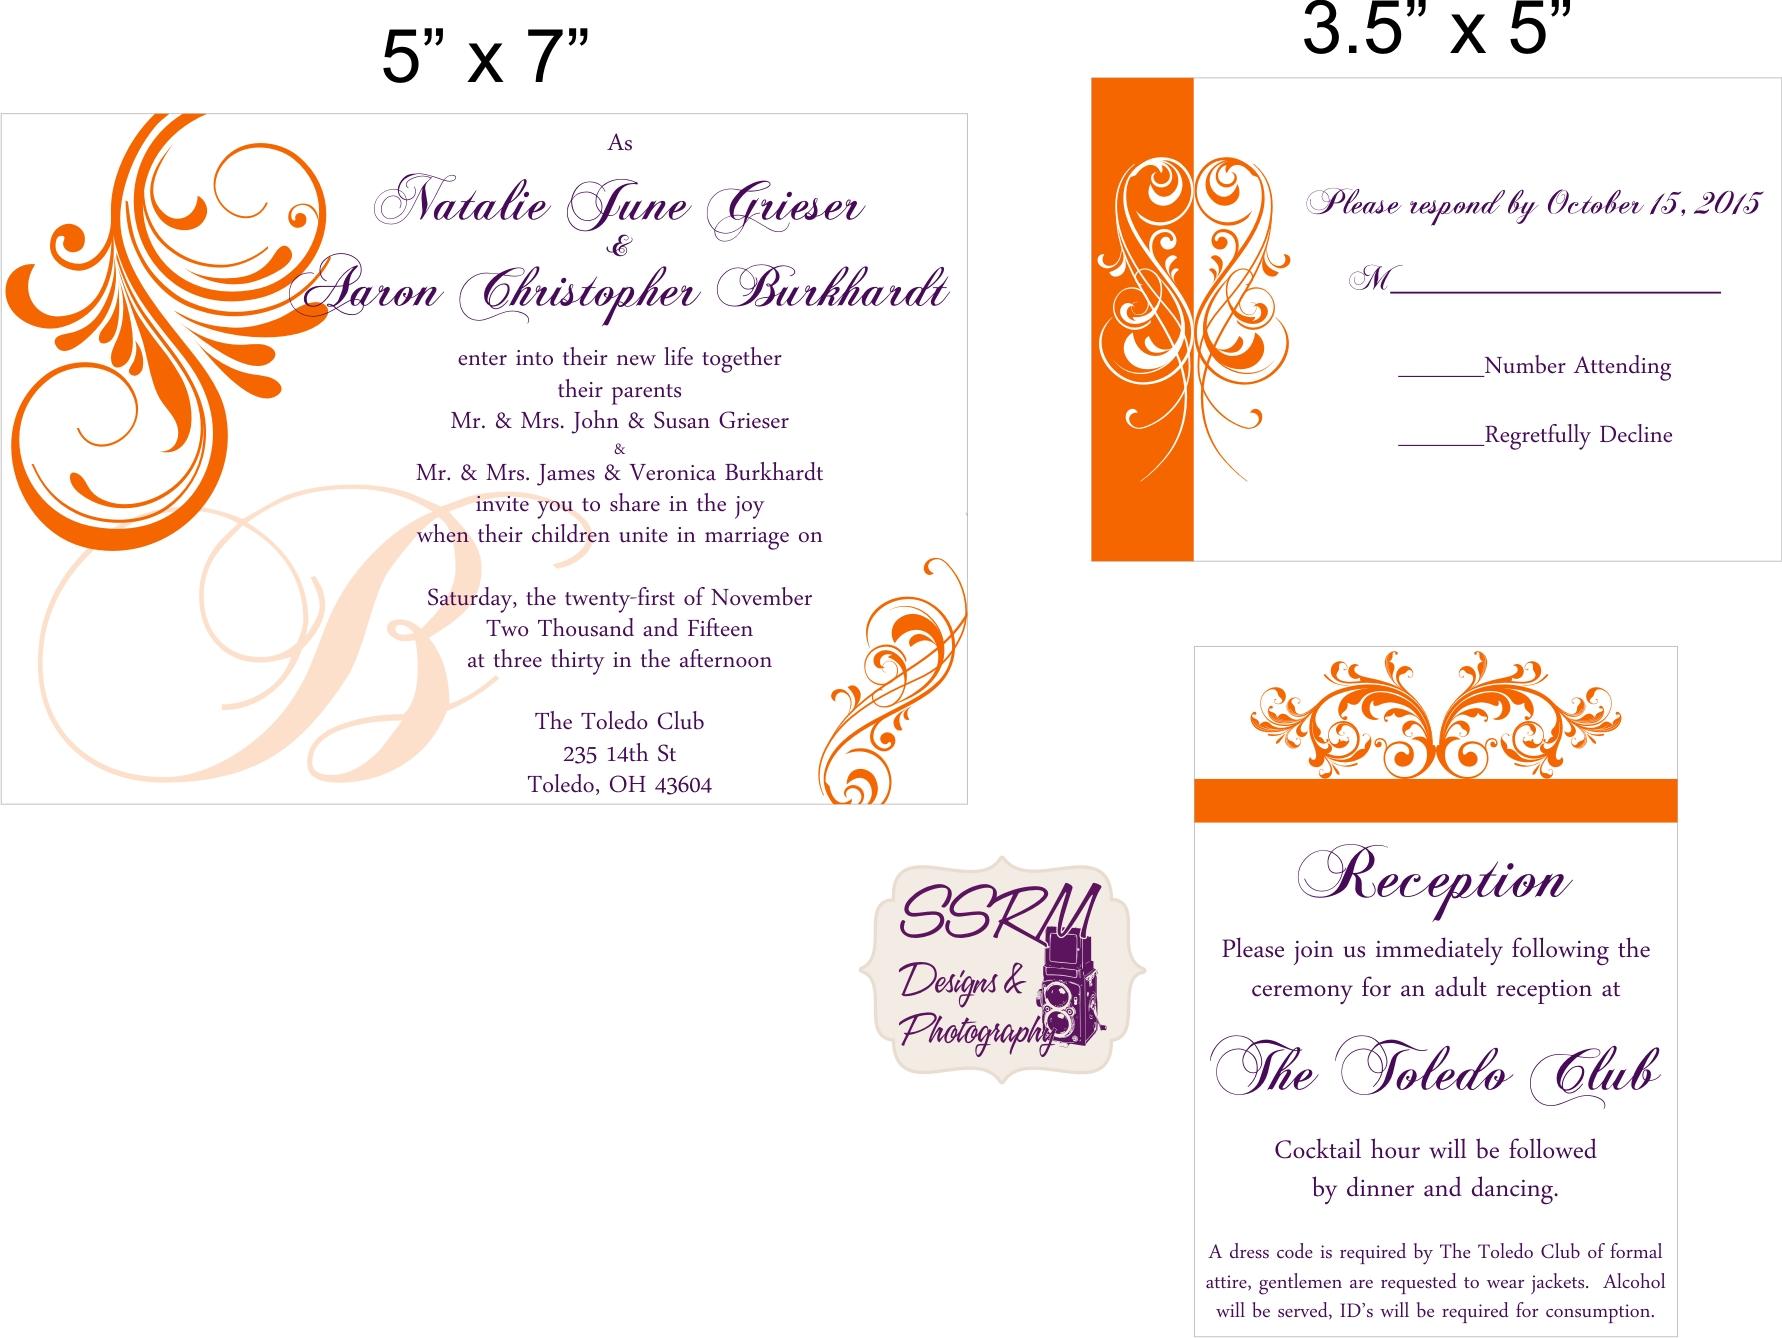 Wedding invitations ssrm designs photography grieser burkhardt wedding invites 1 stopboris Image collections